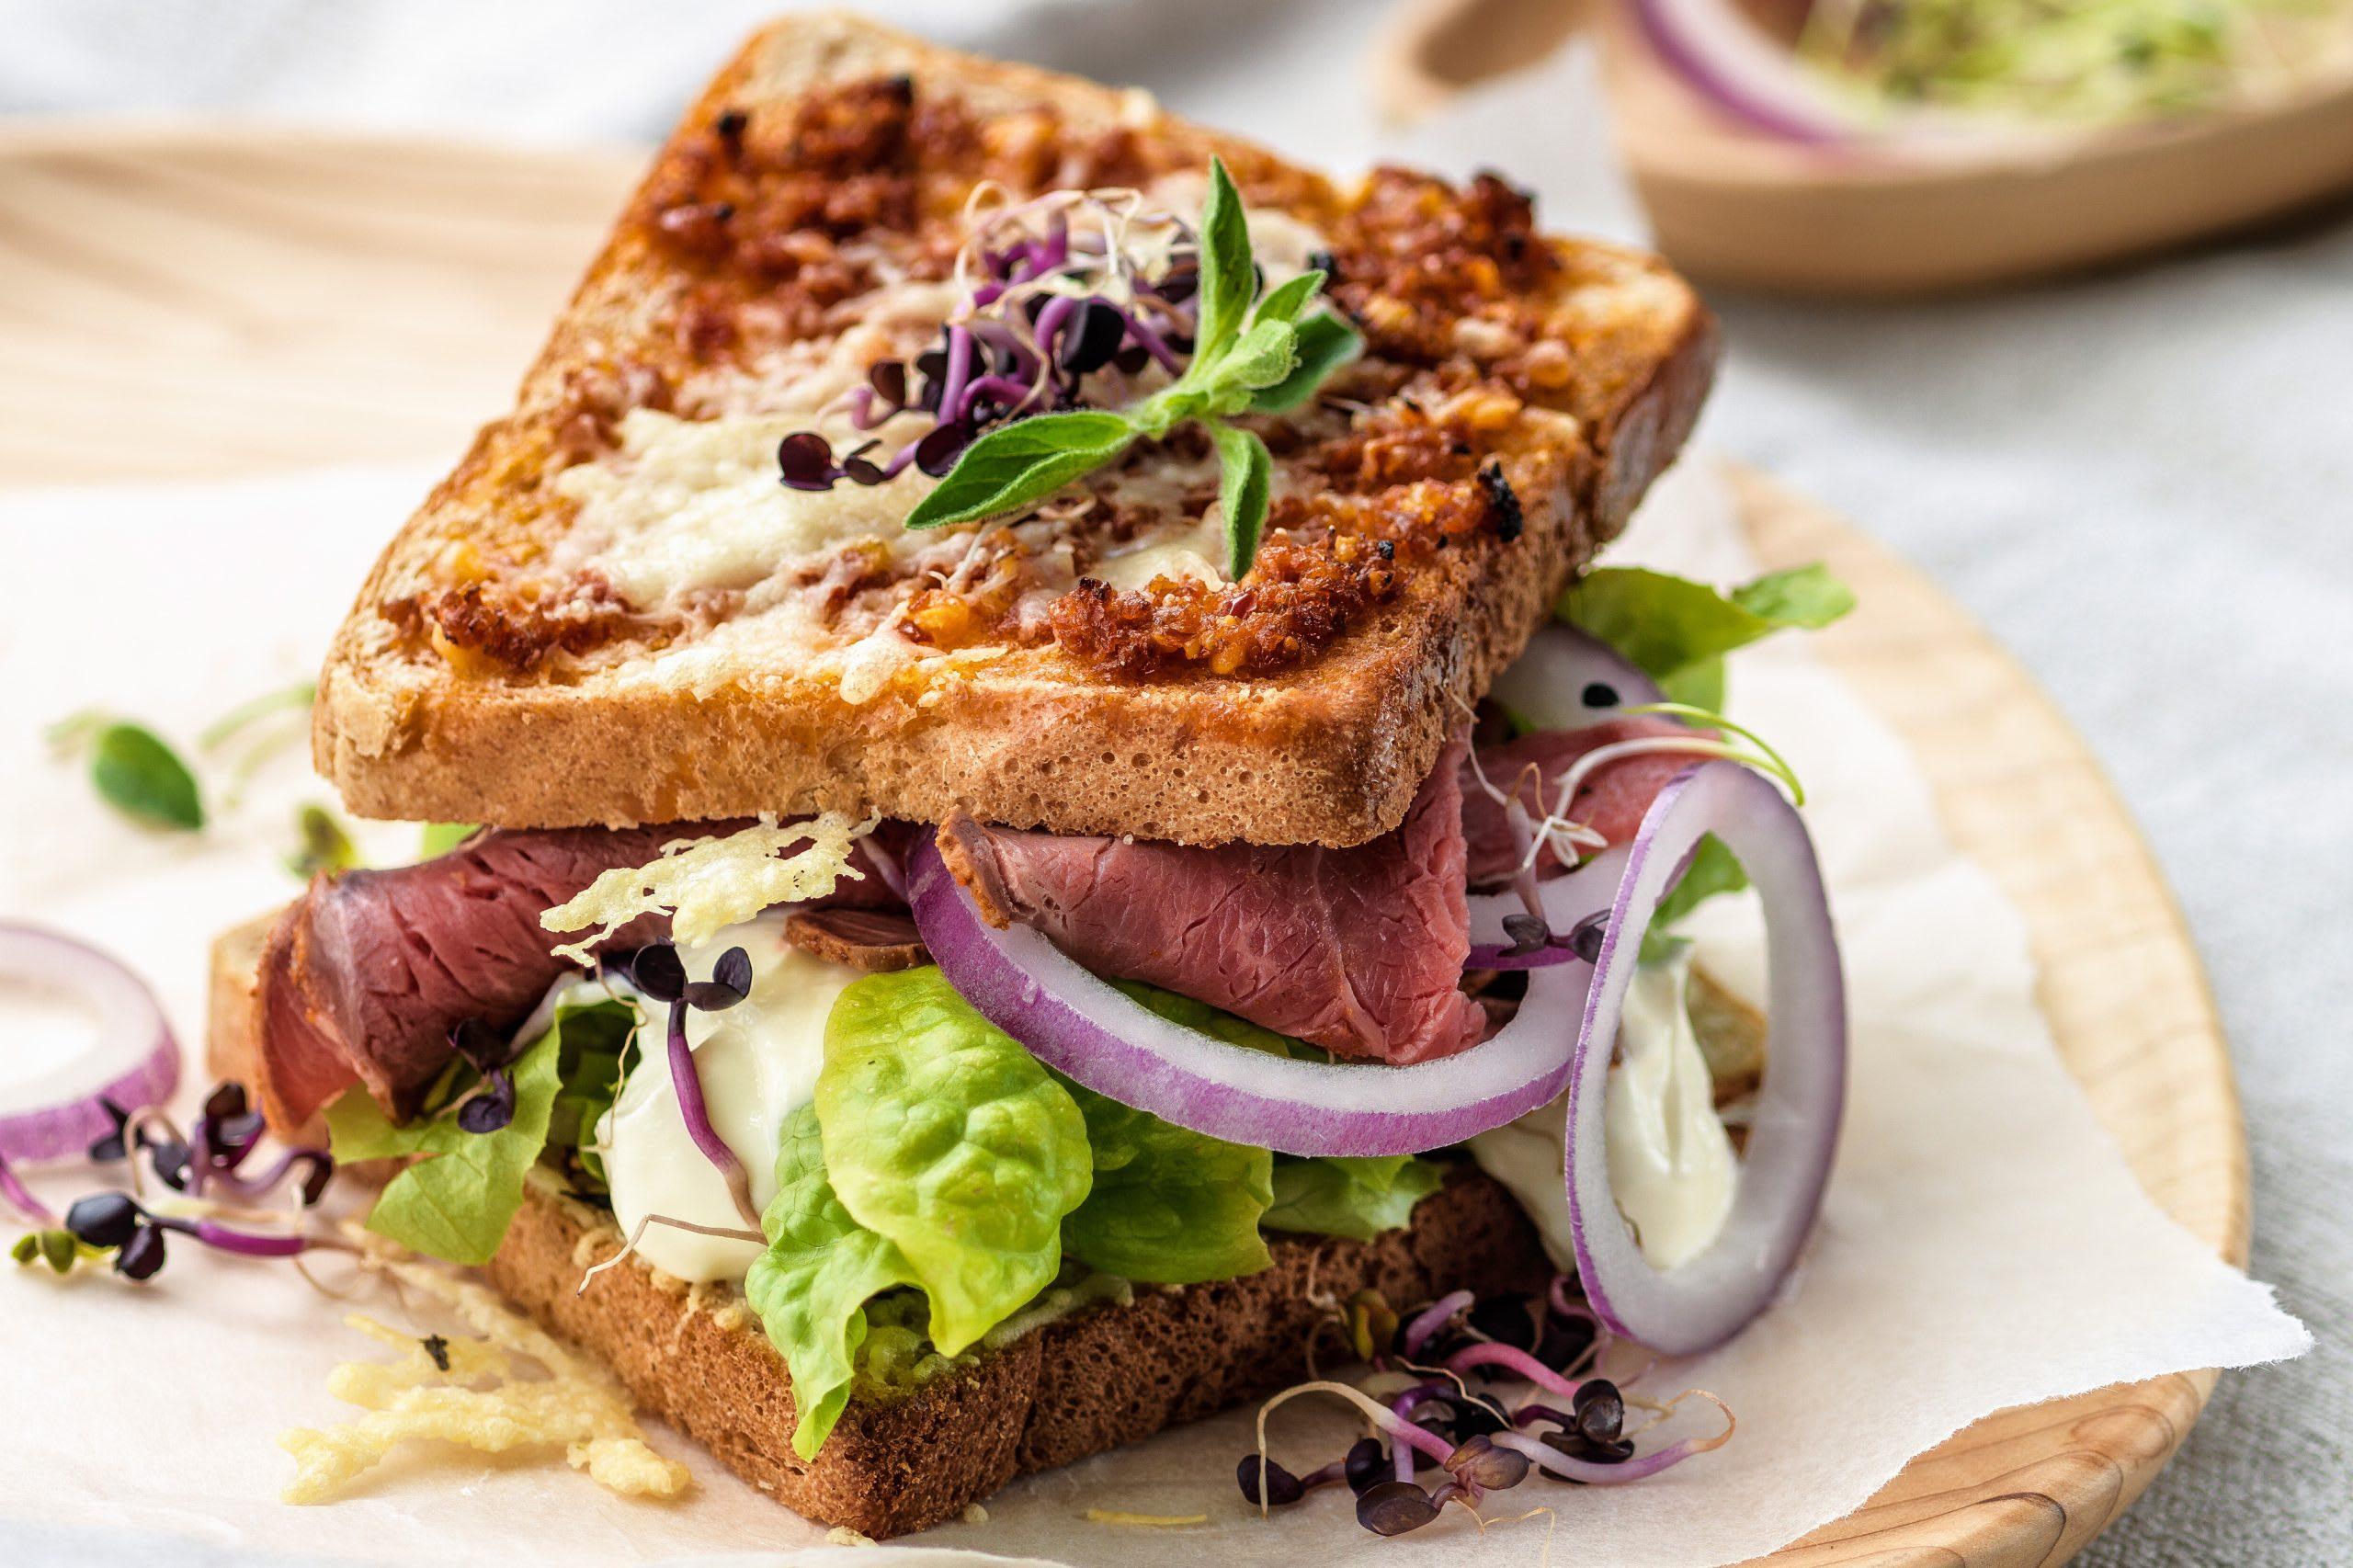 Sandwich au rosbif, toasts au pesto et au fromage